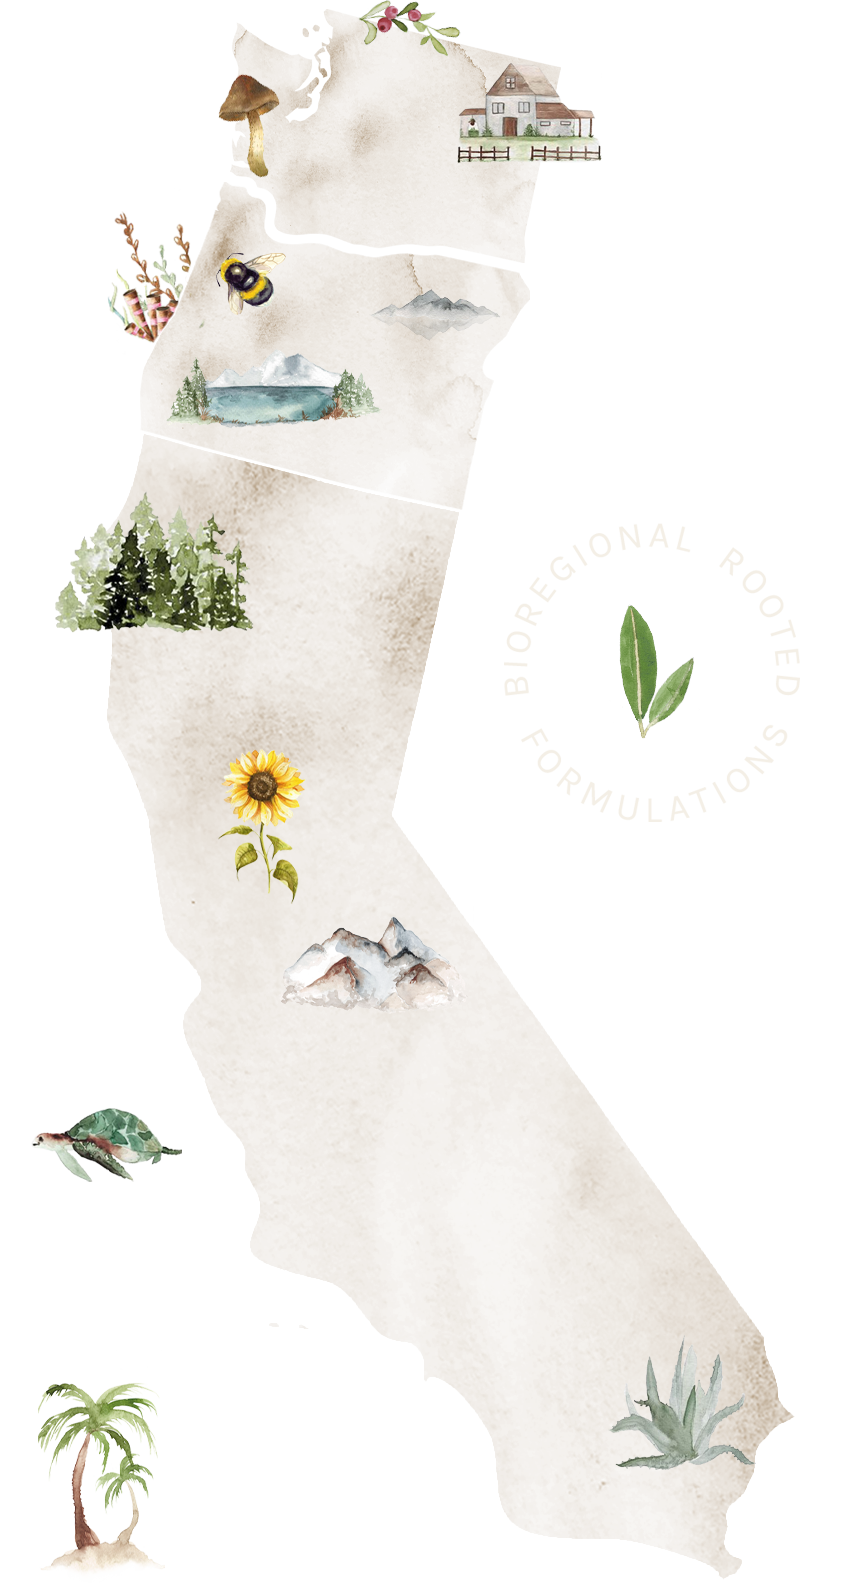 Bioregional Map of Washington, Oregon and California